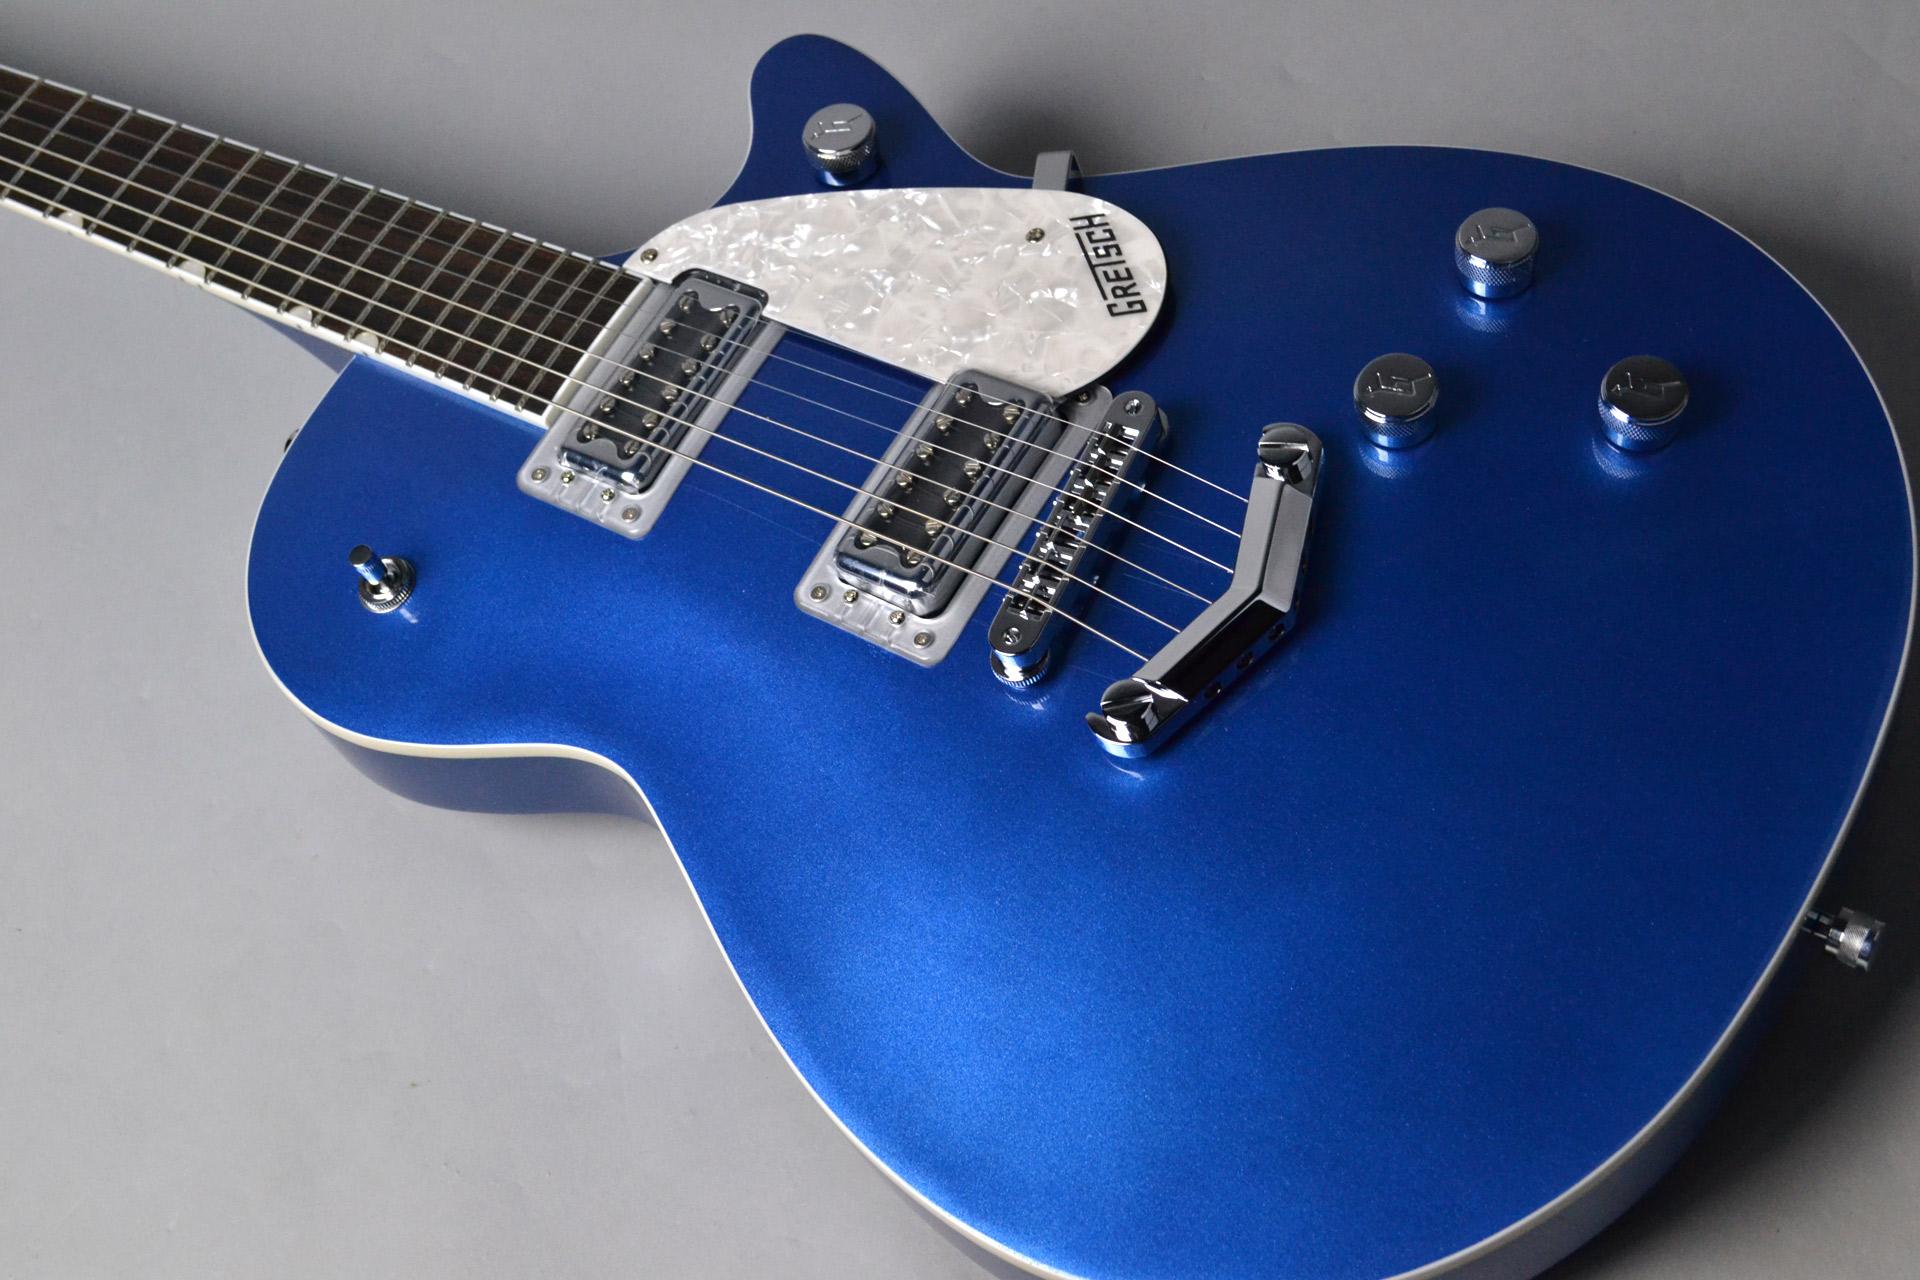 G5435 Limited Edition Electromatic Pro Jet™, Fairlane Blueの全体画像(縦)